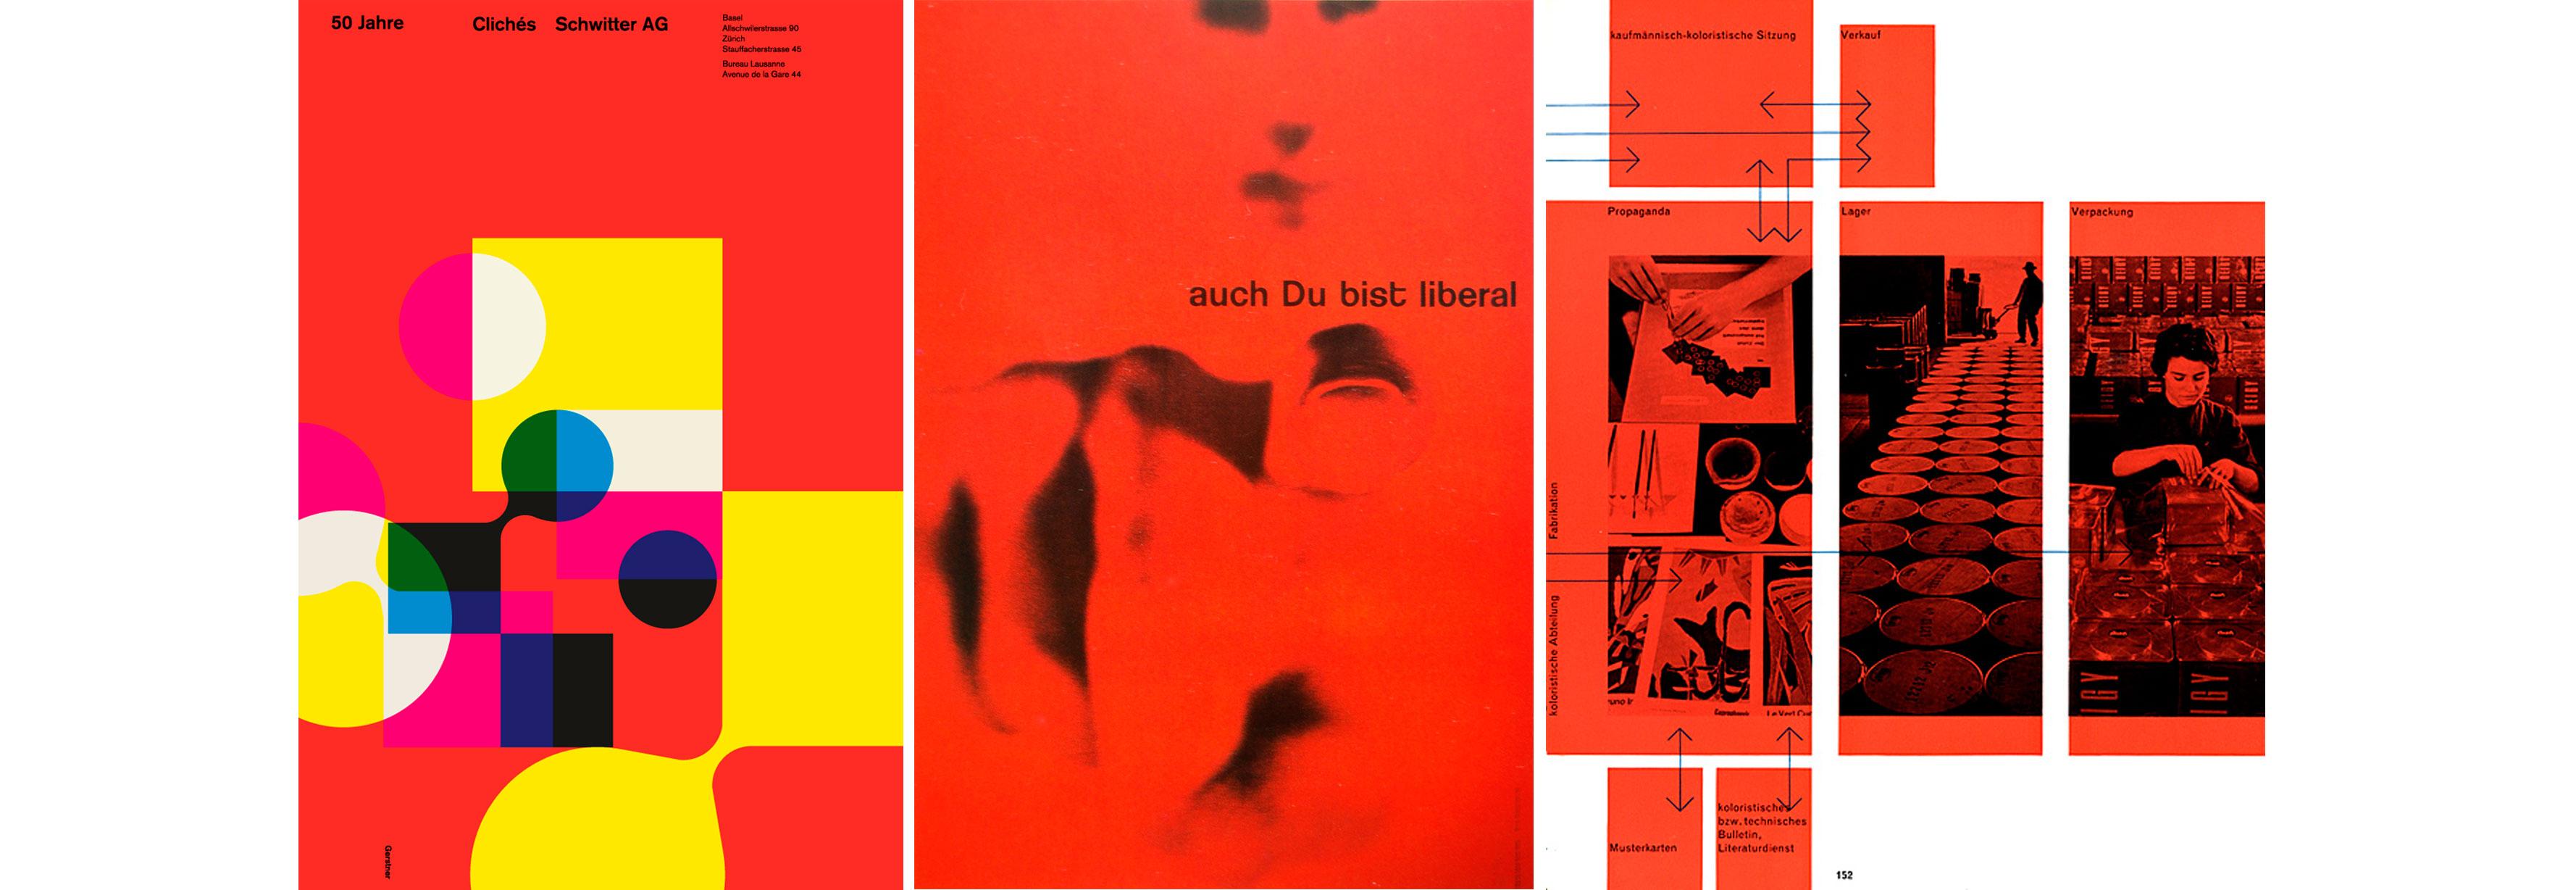 Karl-Gerstner-posters